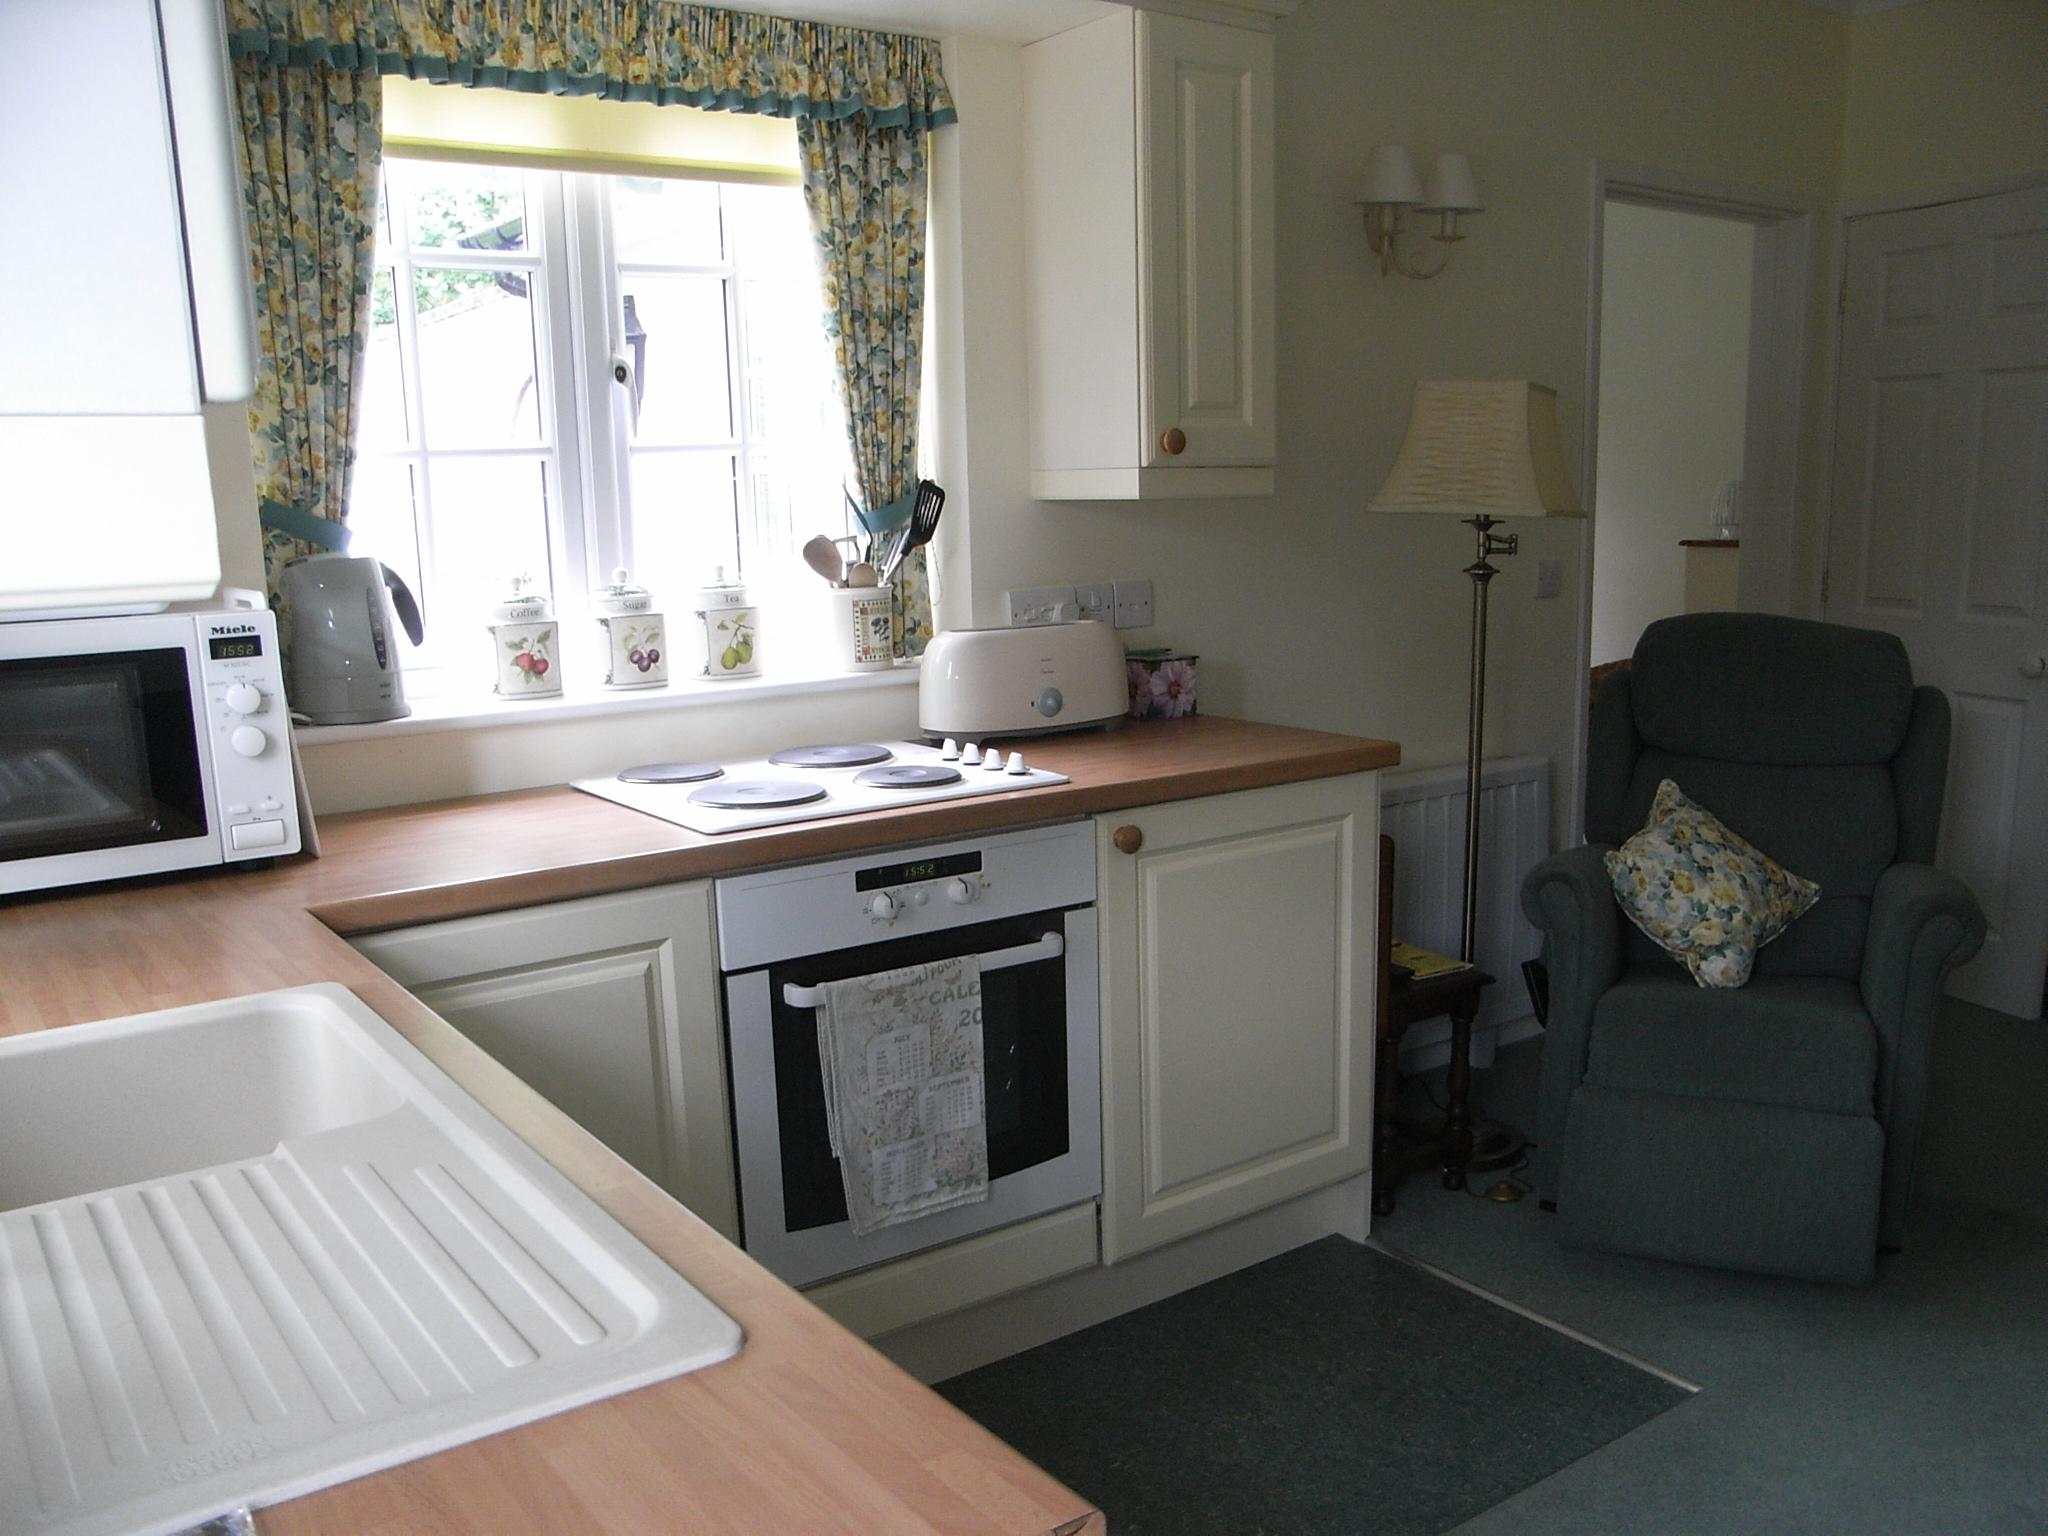 Property to rent, property to let, Warminster, John Loftus Property Centre